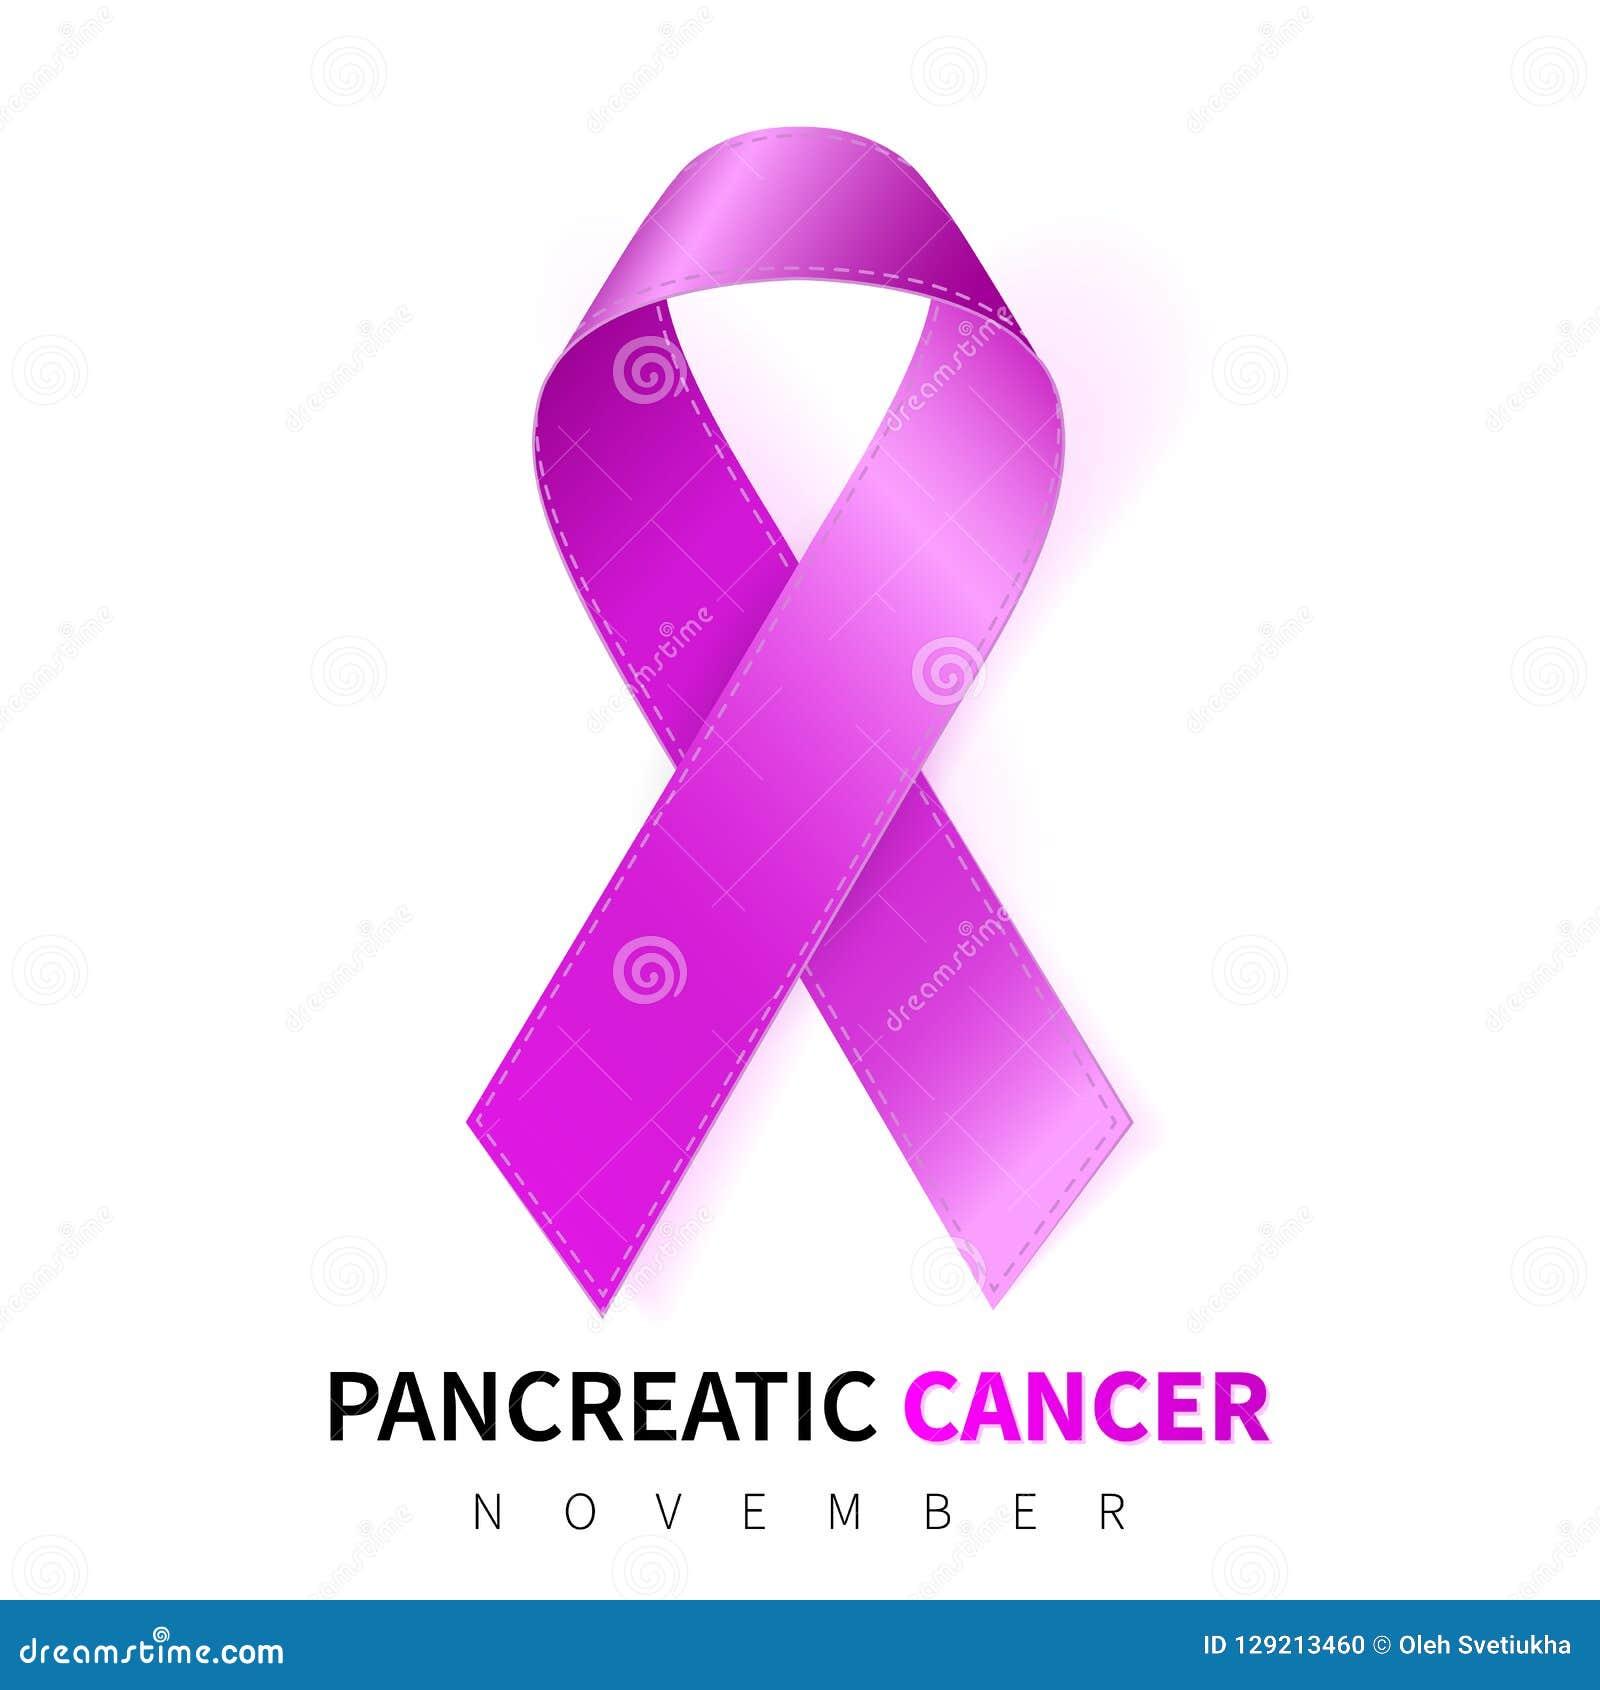 pancreatic cancer charity)